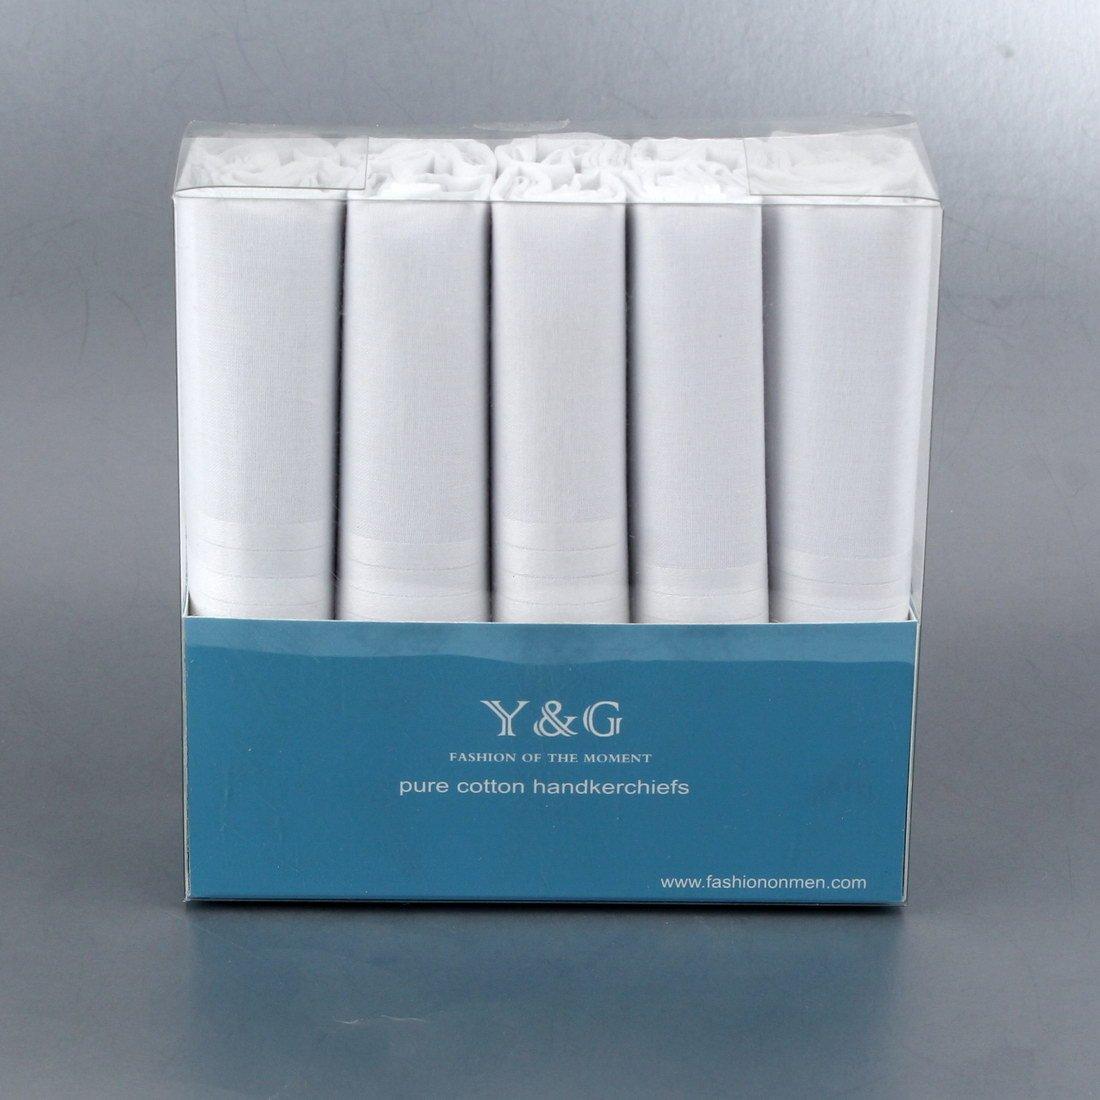 Y/&G Mens Fashion Designer Gift for Mens 10 Pack Handkerchiefs Set School Husband